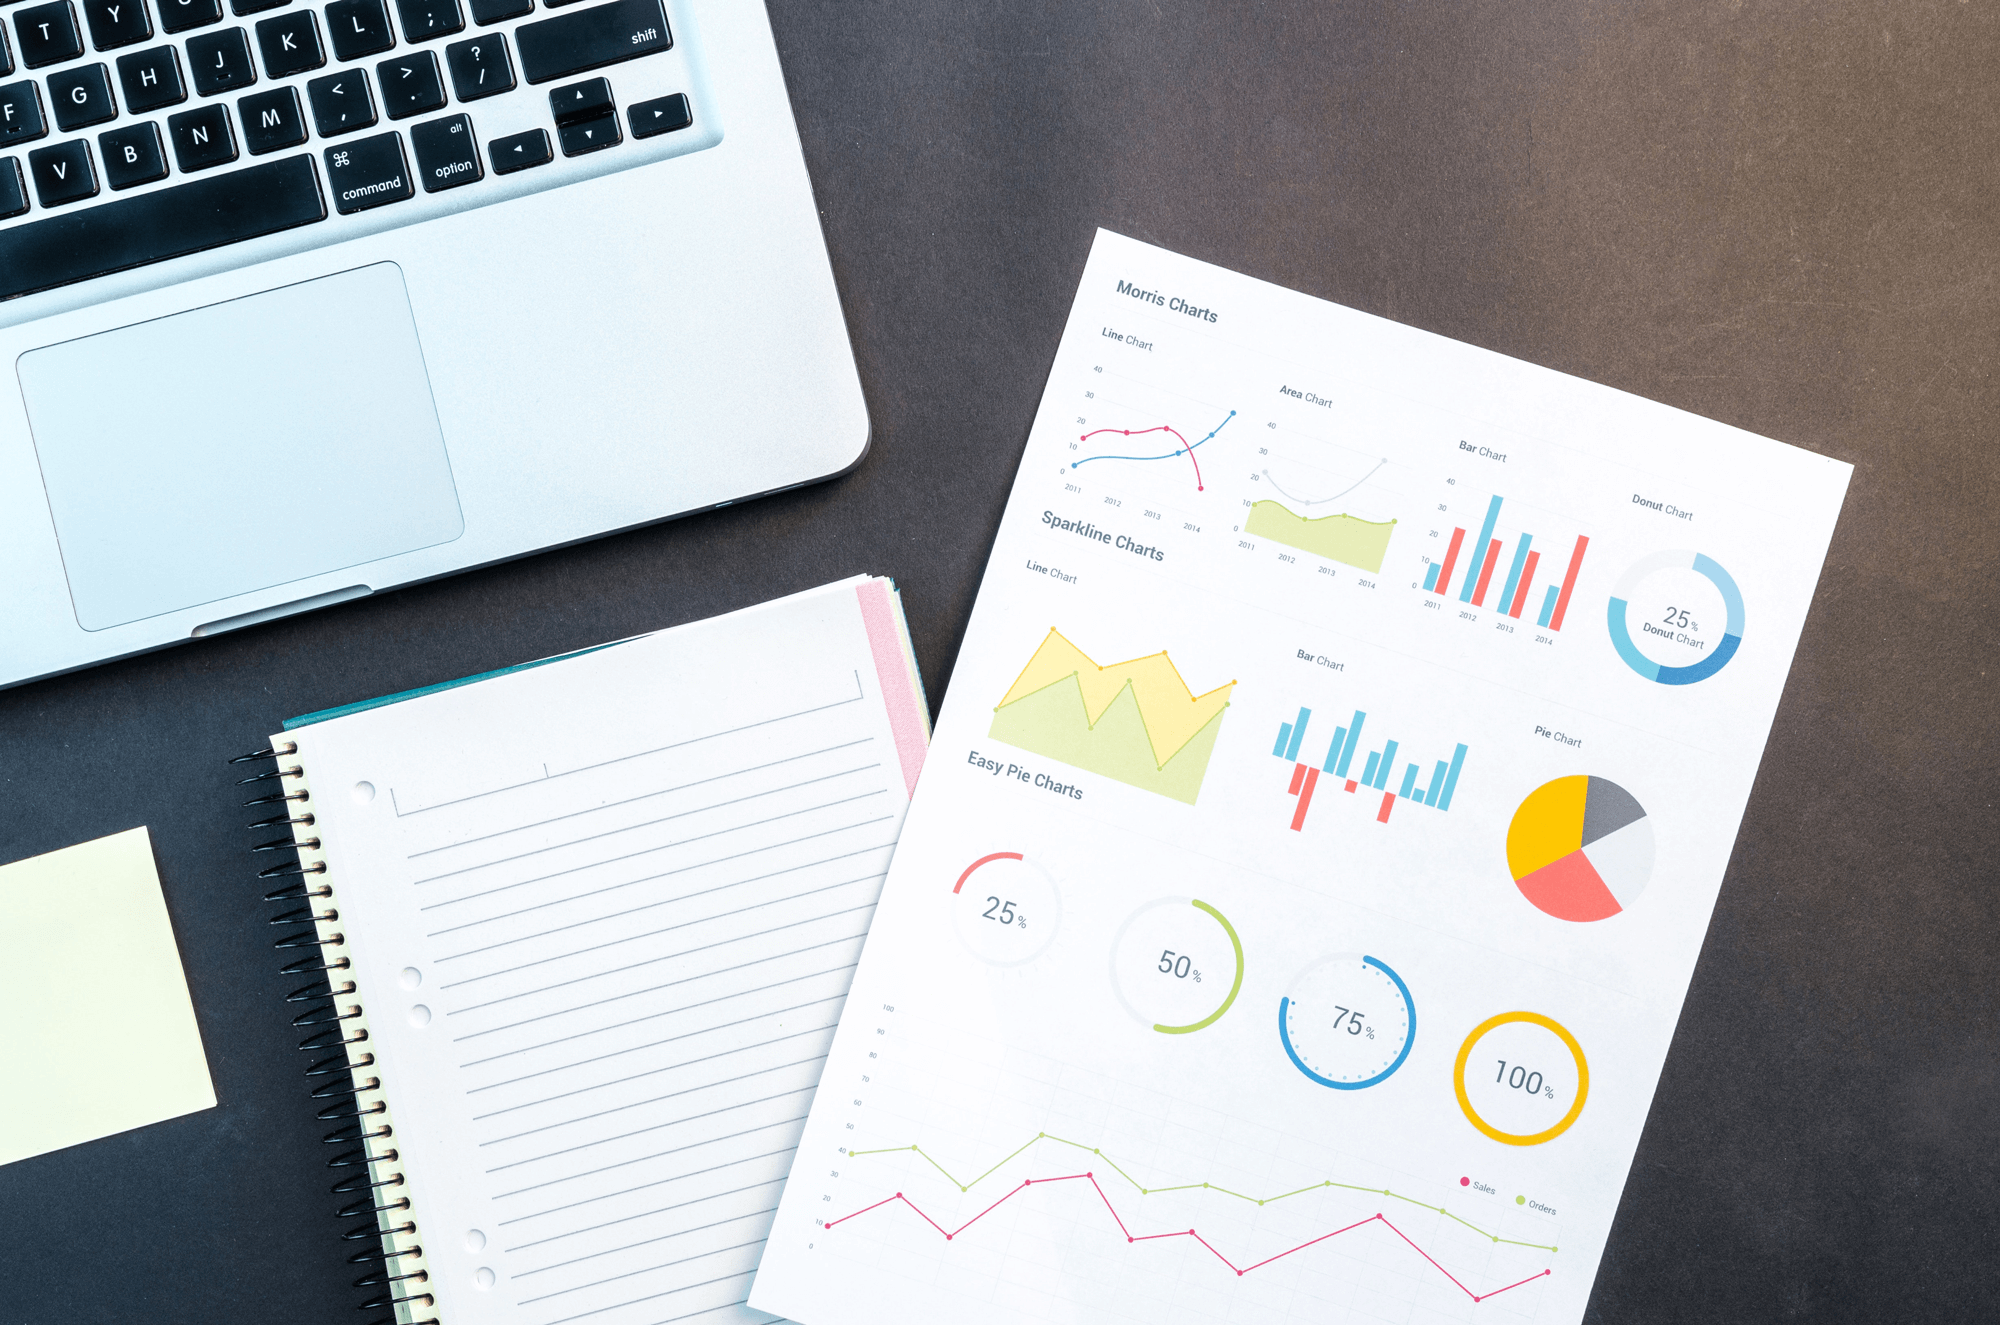 Data visualization makes data tangible & legible